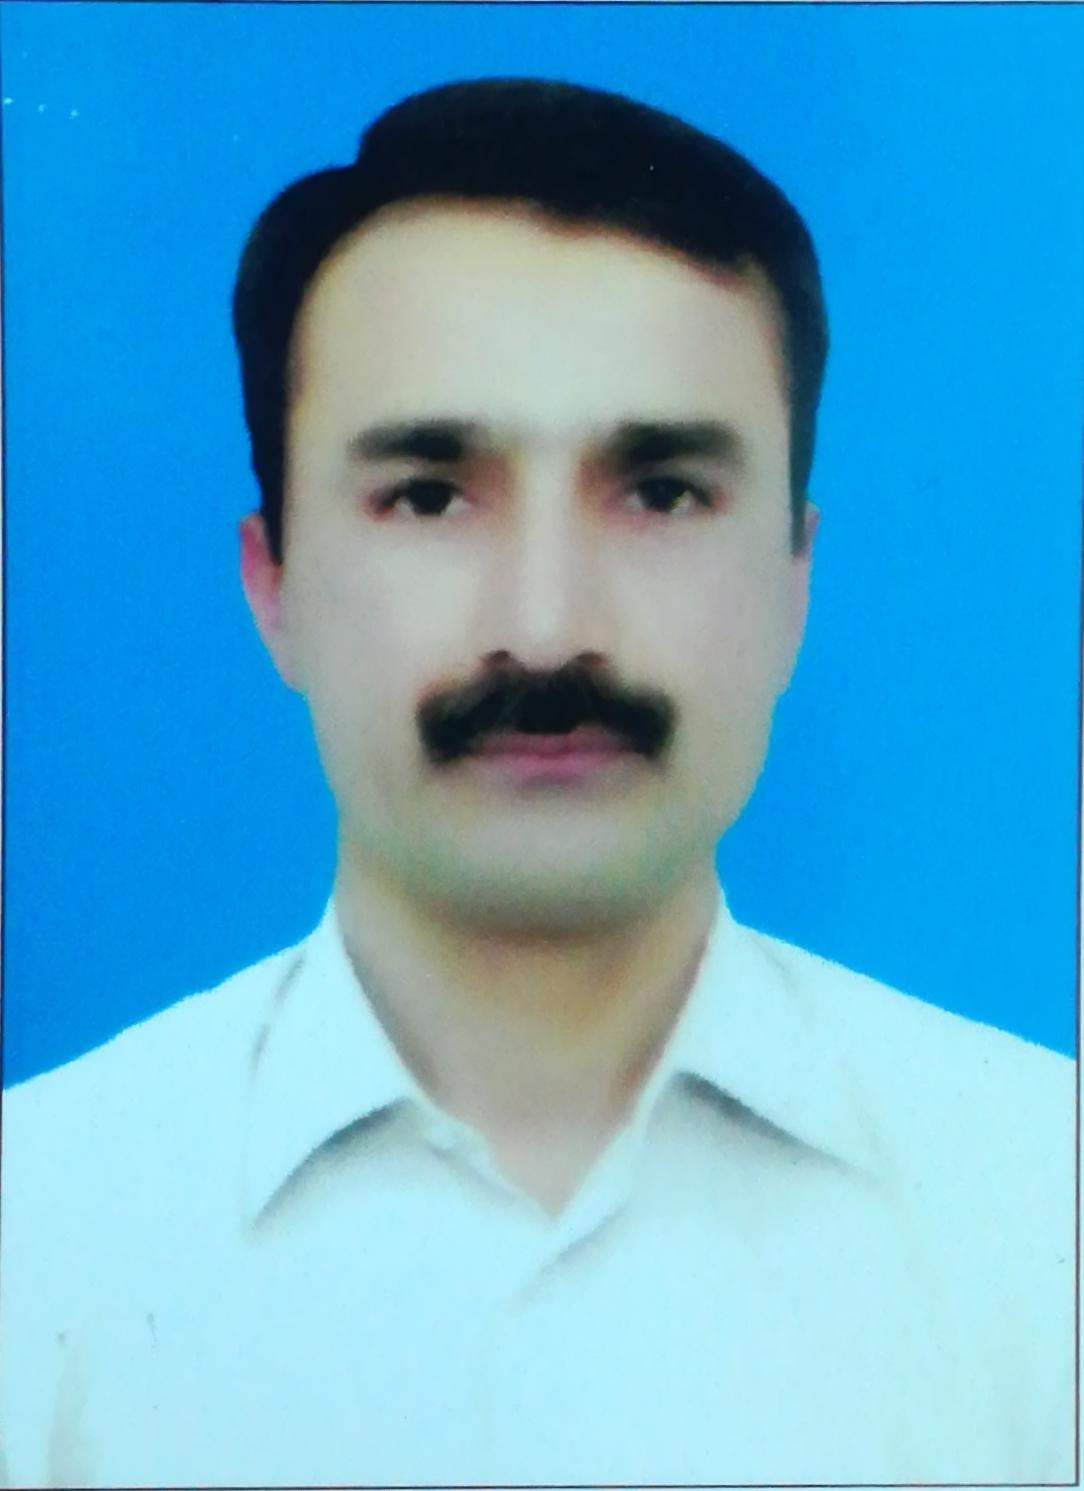 Dr. Ayyaz Mahmood